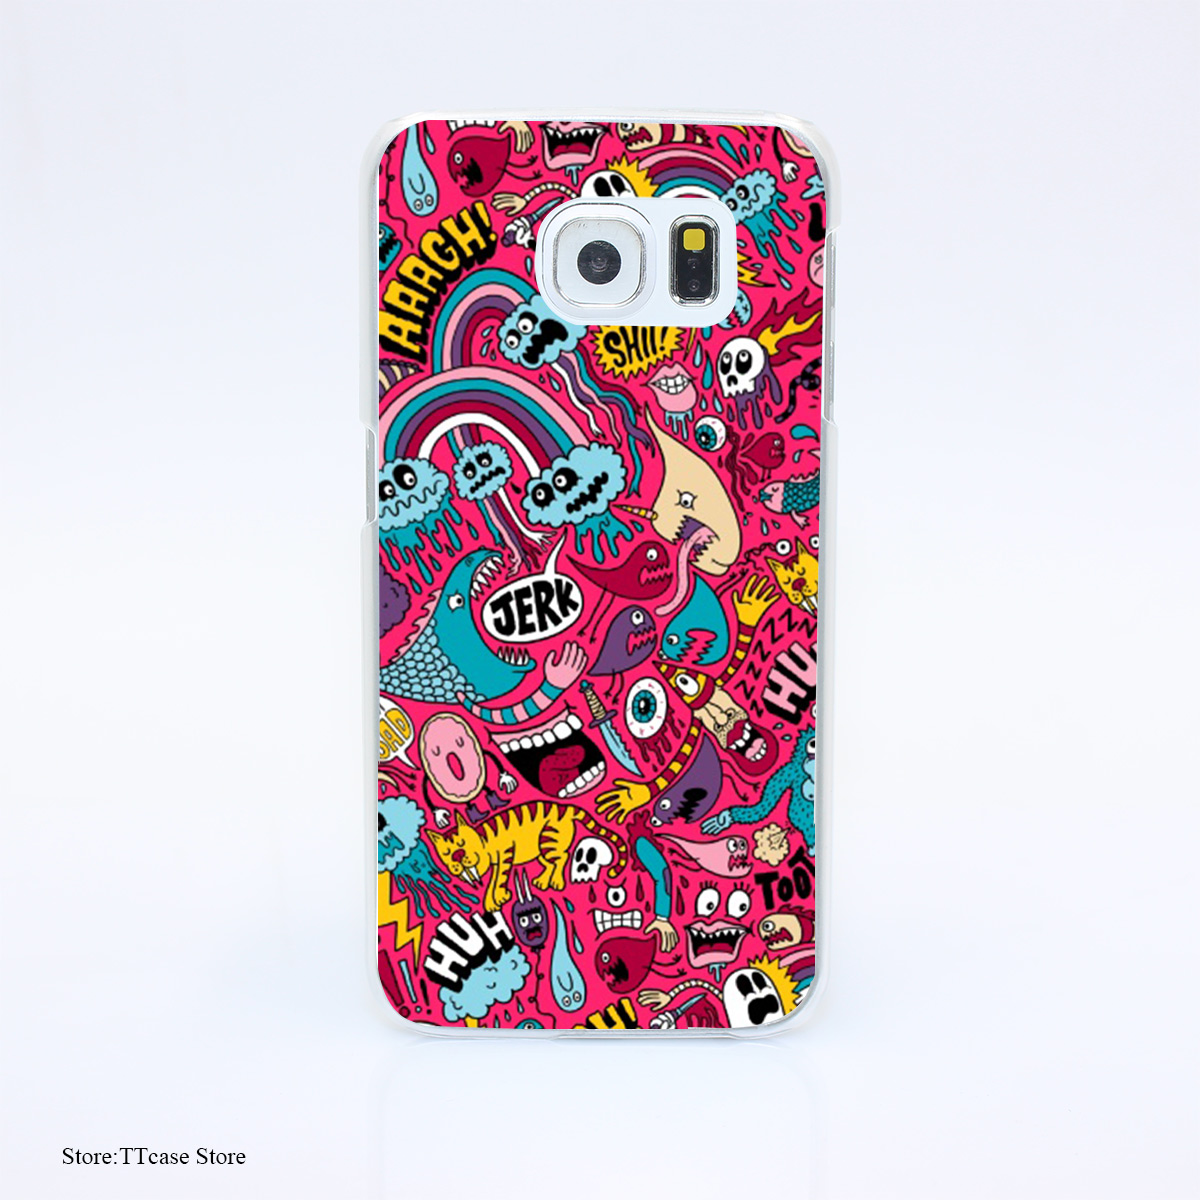 2878G Sad Donut Jerk Print Hard Transparent Case Cover for Galaxy S3 S4 S5 & Mini S6 S7 & edge